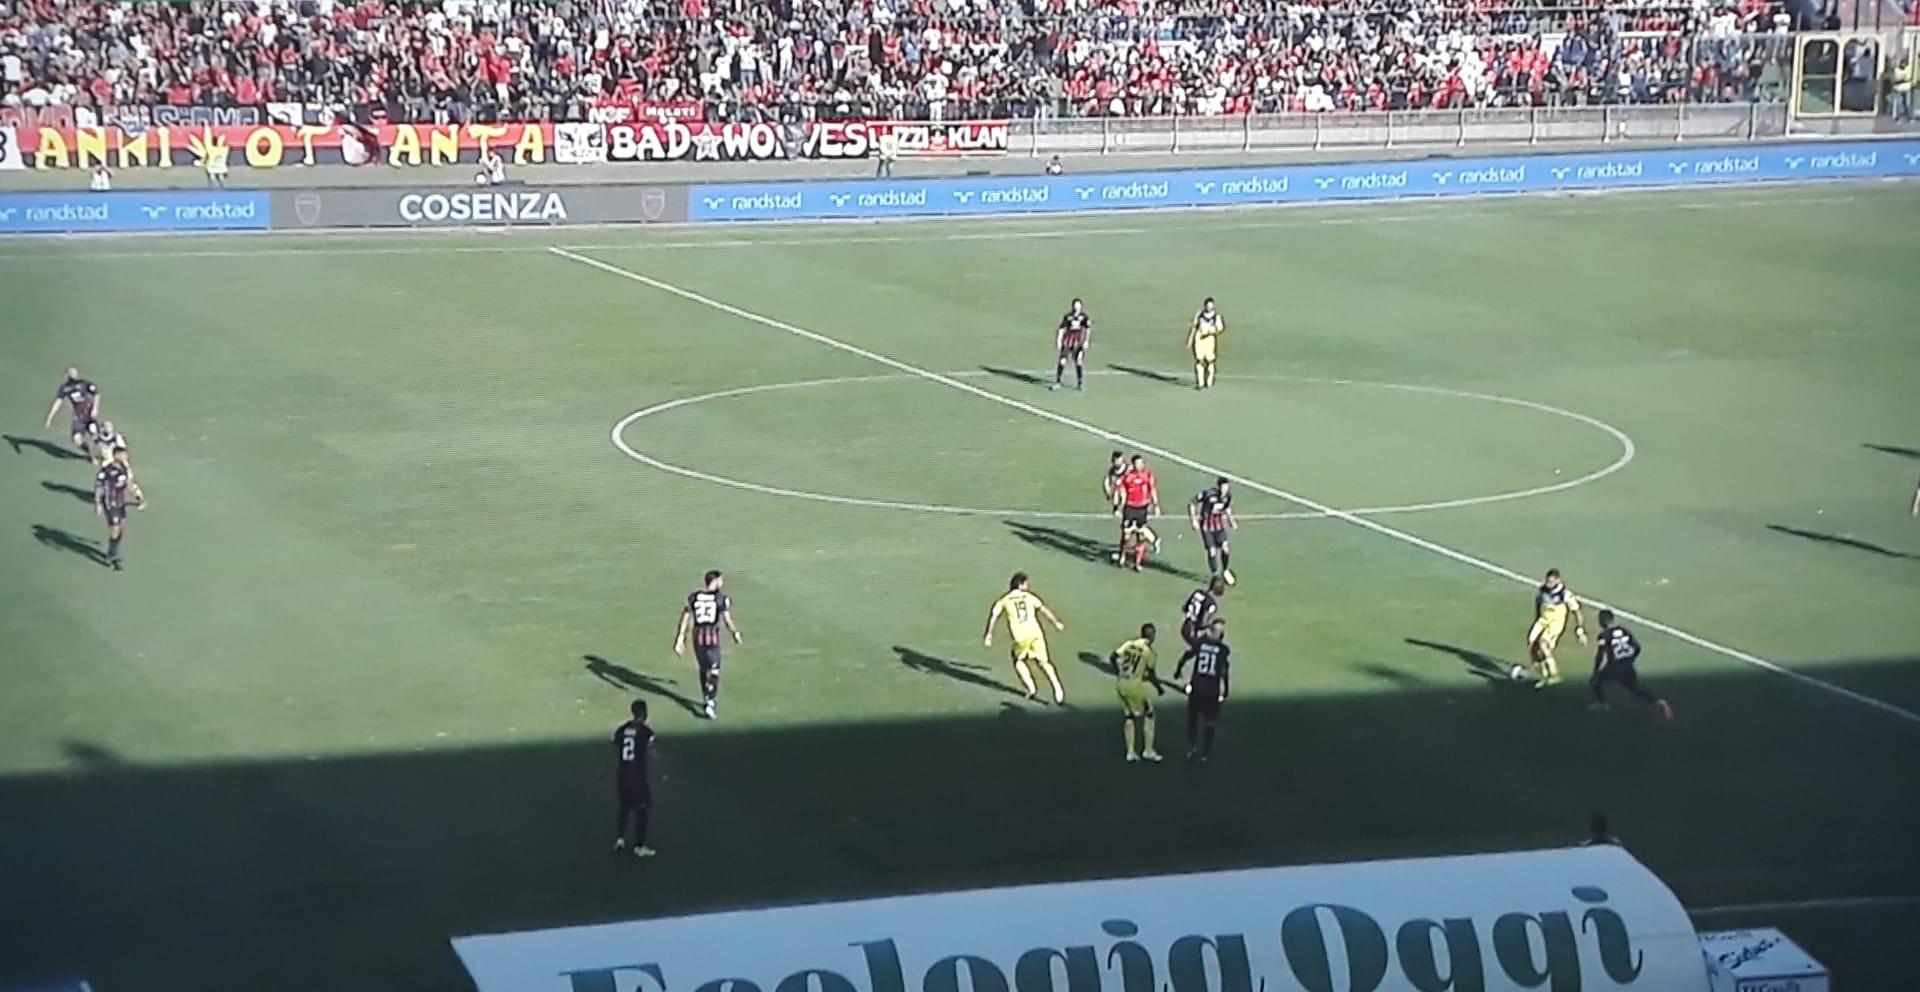 L'assist di Kastanos per il gol decisivo